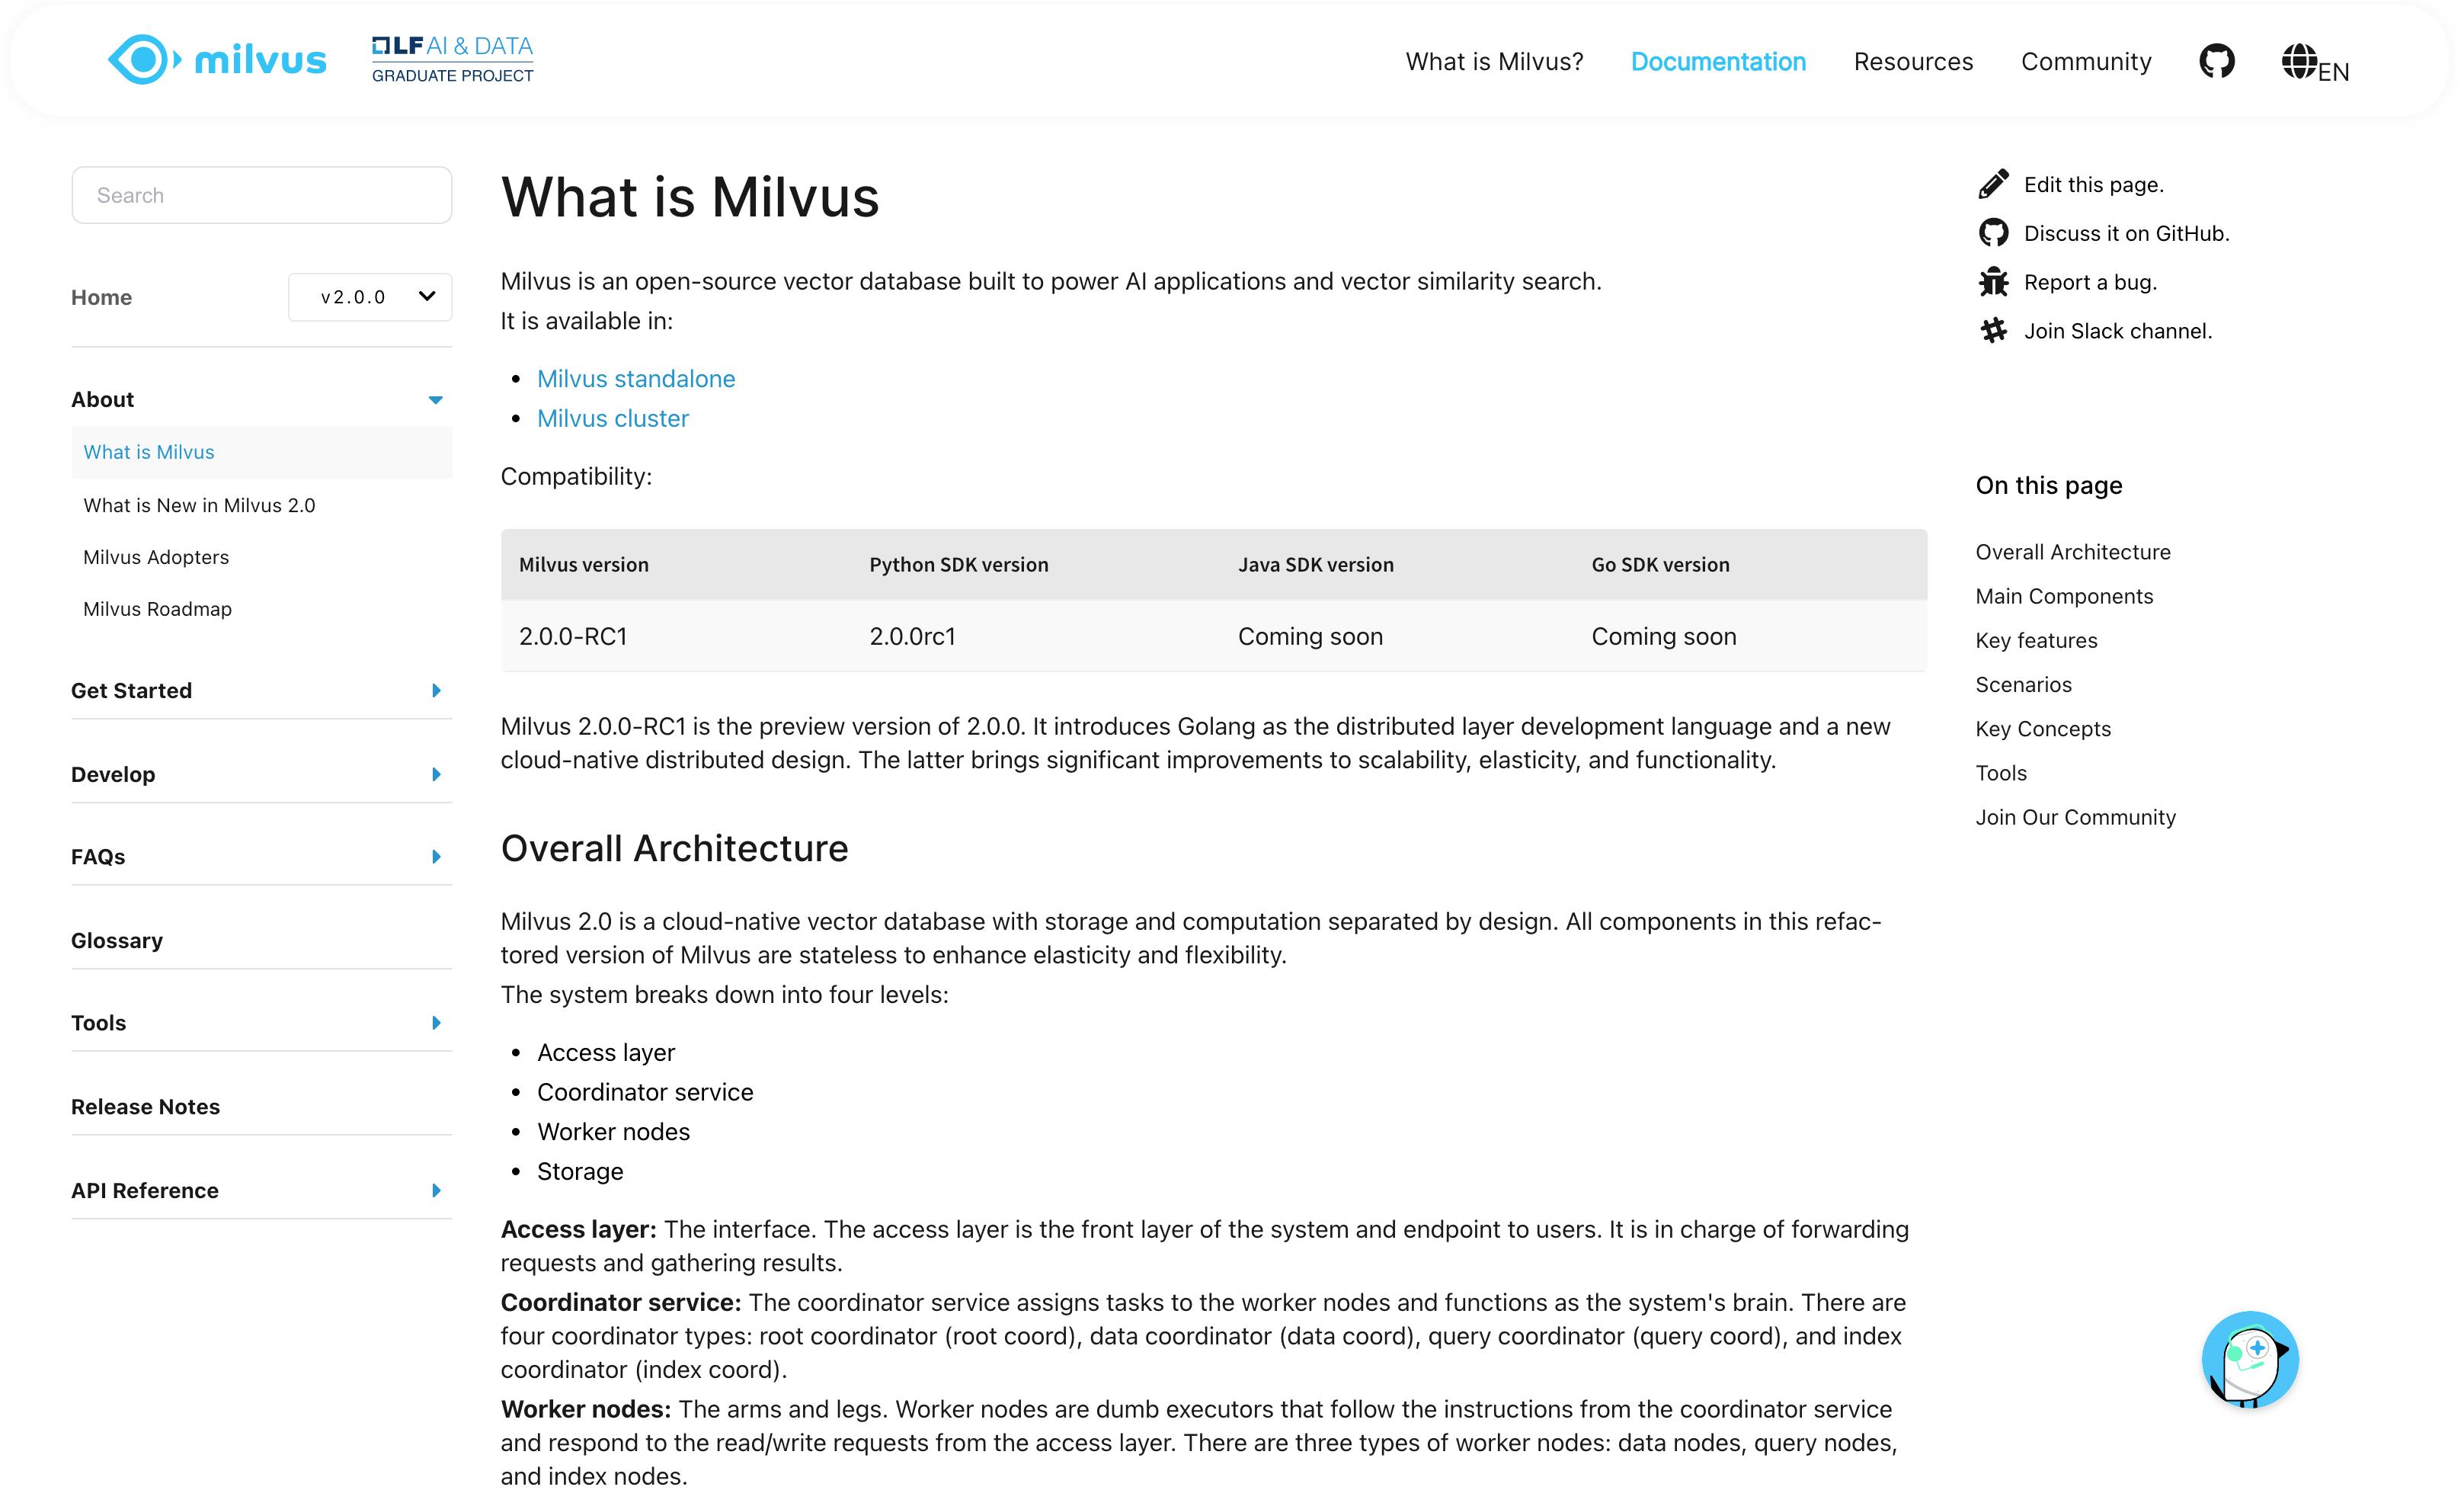 milvus-chatbot-icon.png